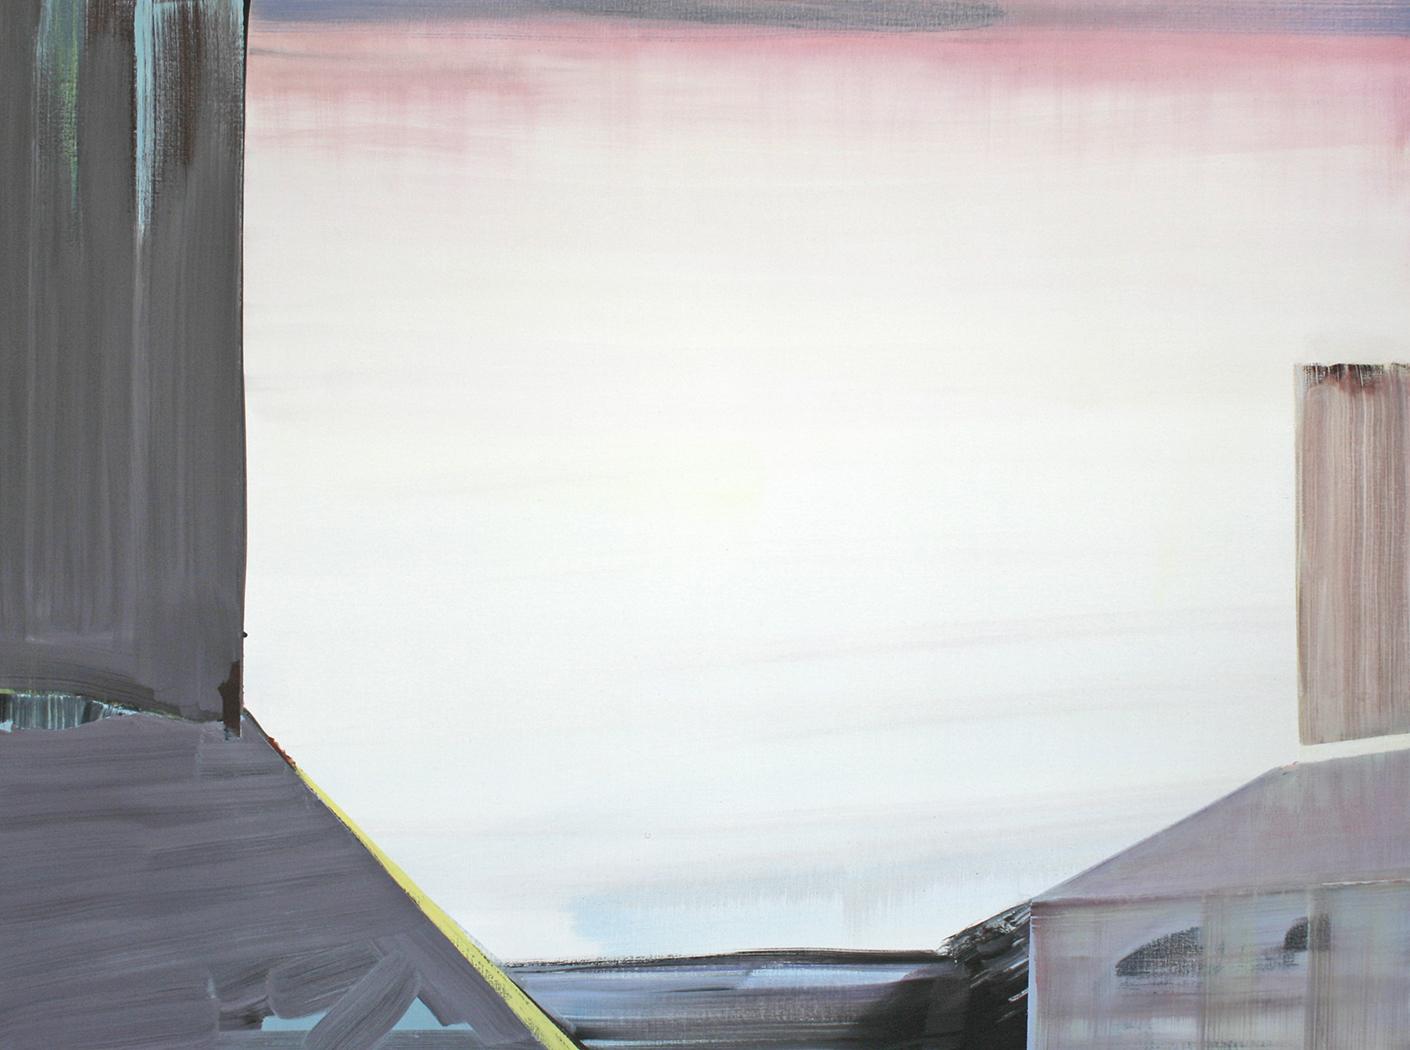 2014 oilpaint on canvas 120 x 160 cm